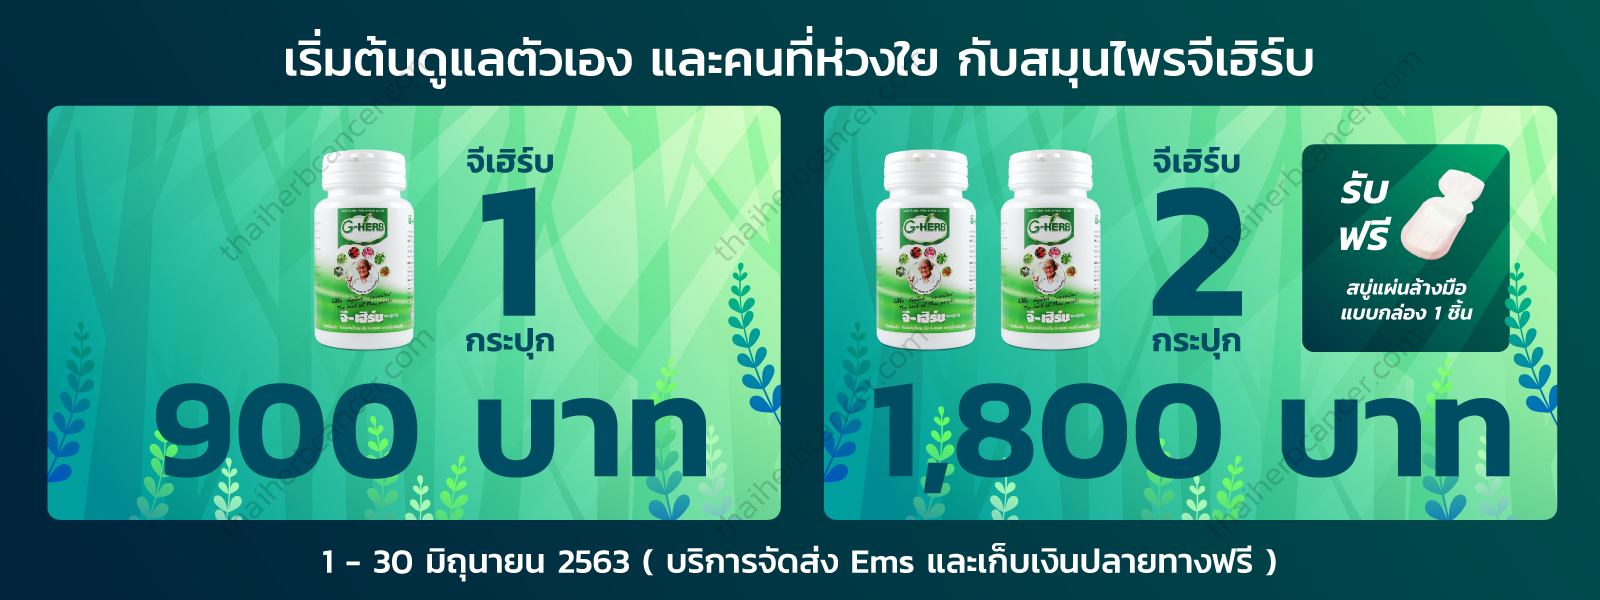 thaiherbcancer-Promotion-JUN-2020-1